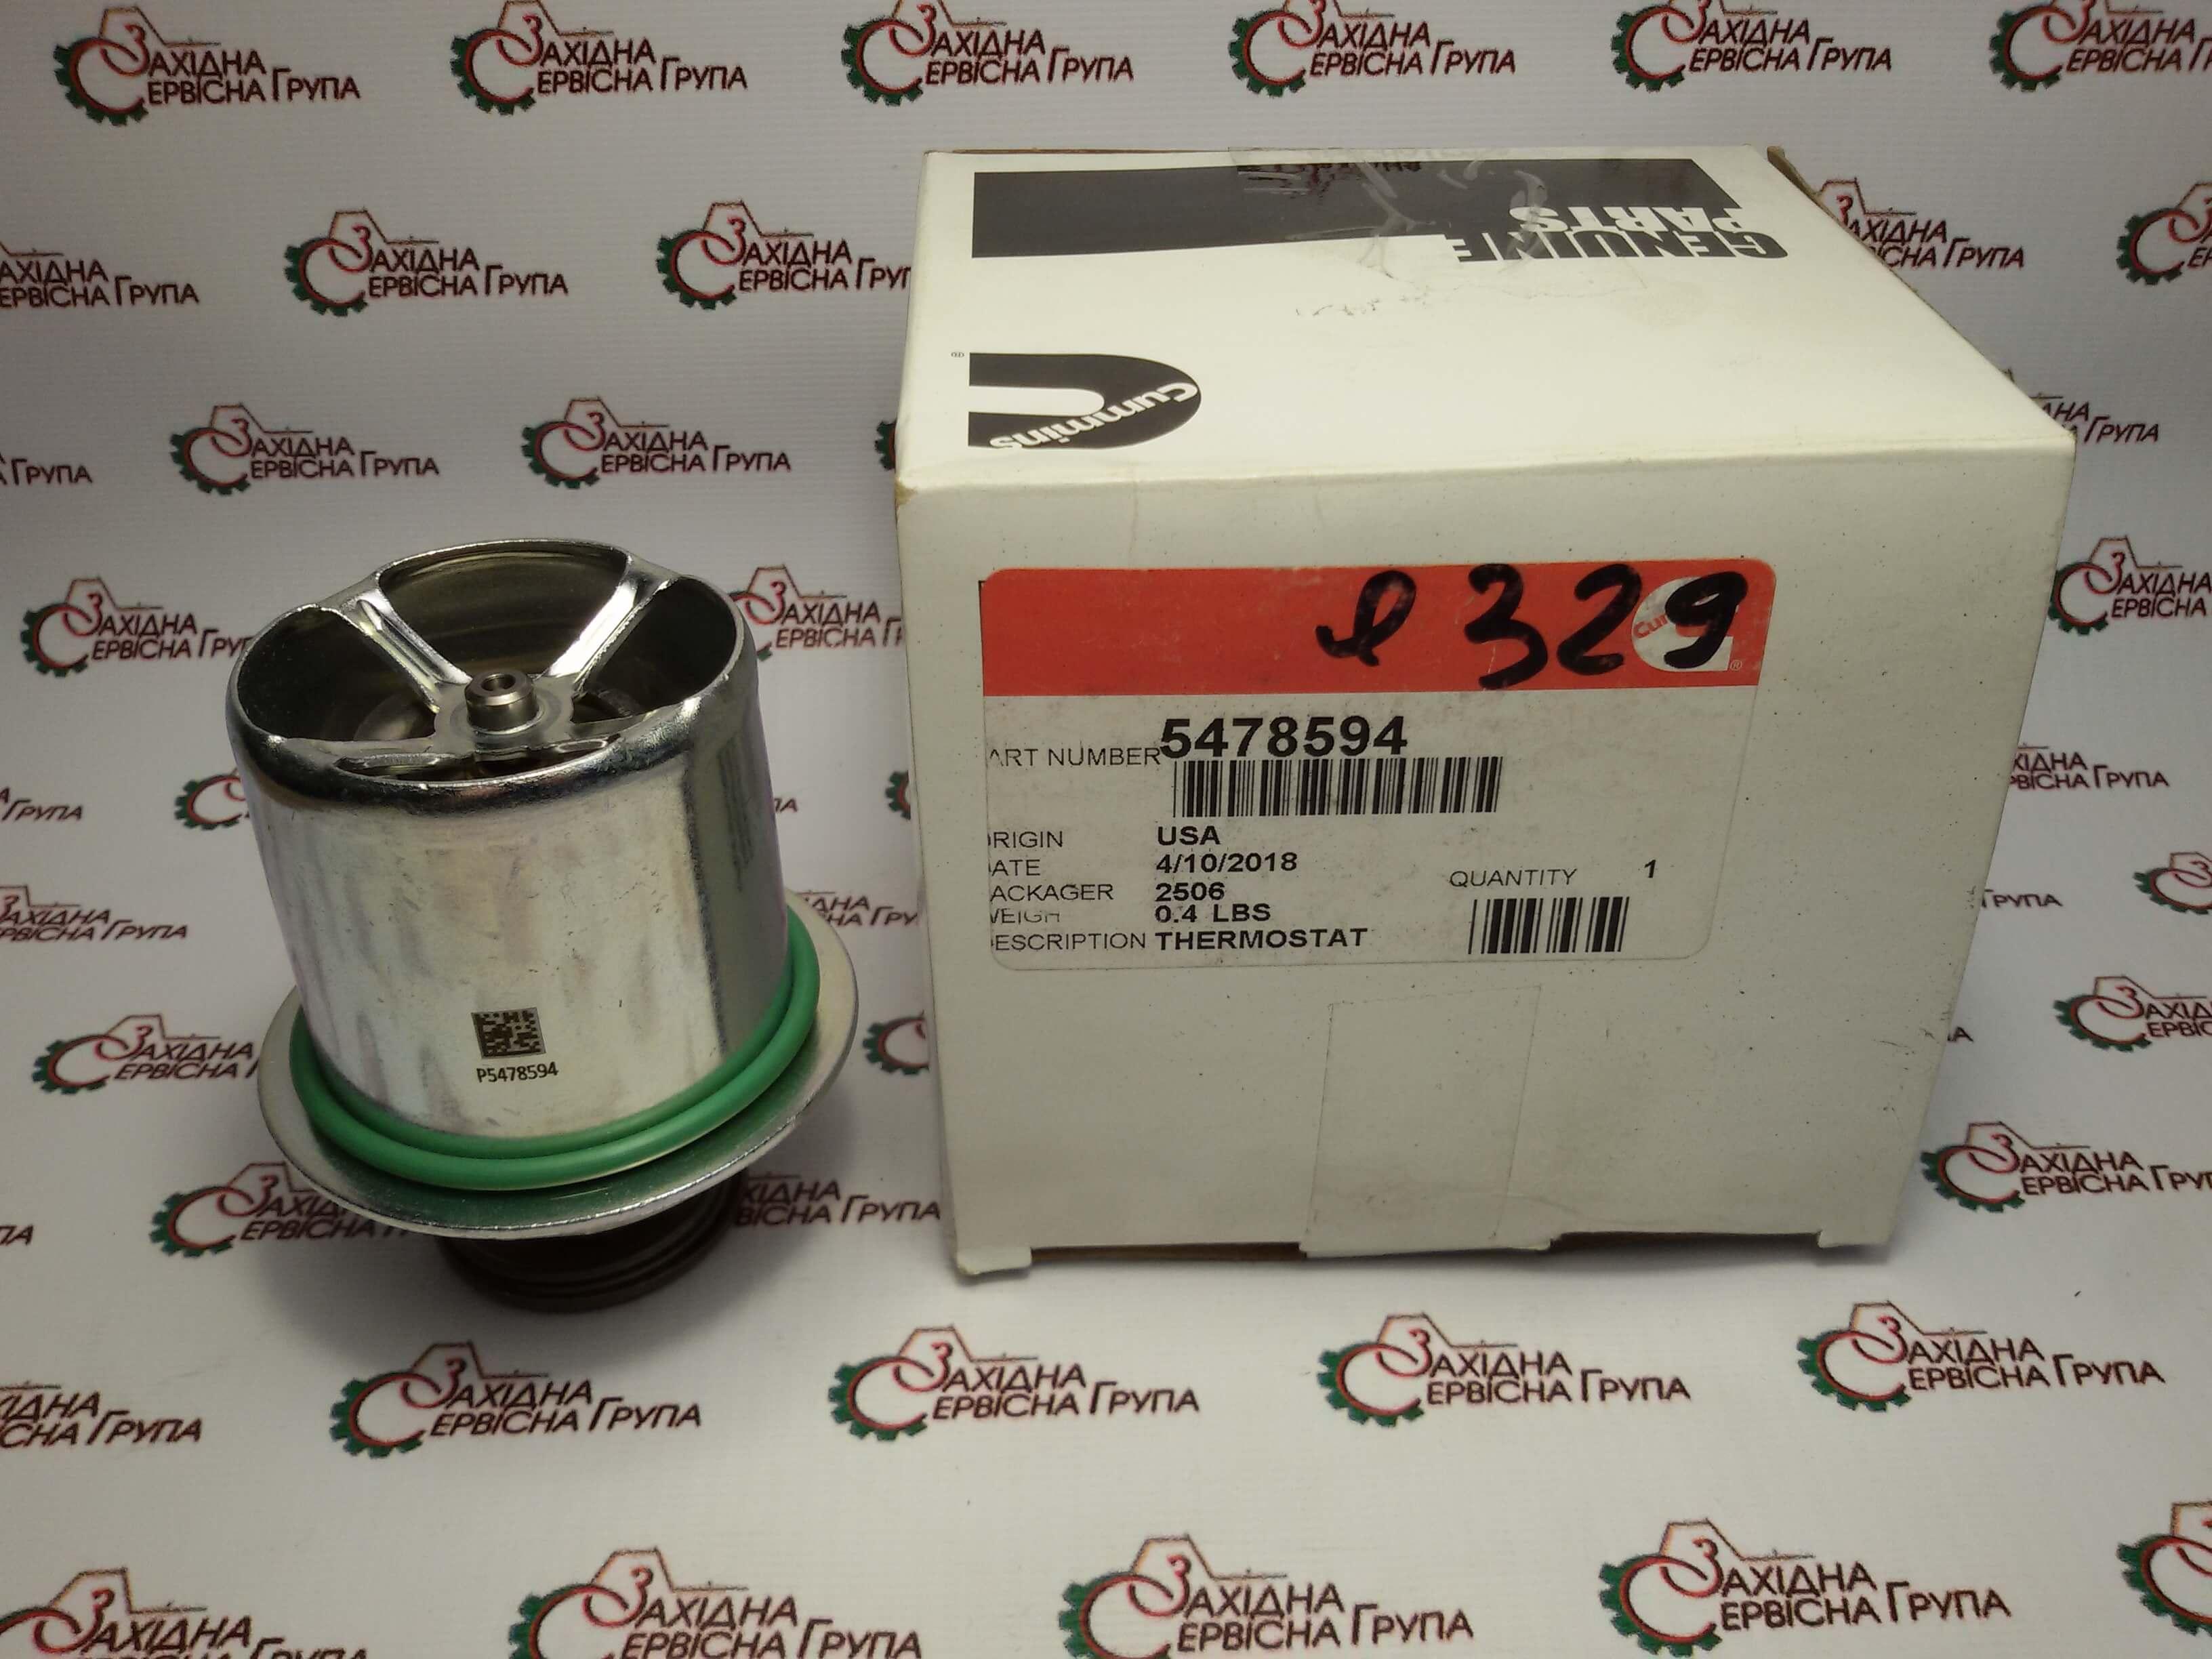 Термостат системи охолодження двигуна Cummins ISC, QSC8.3, QSL9, 5478594, 5274349.